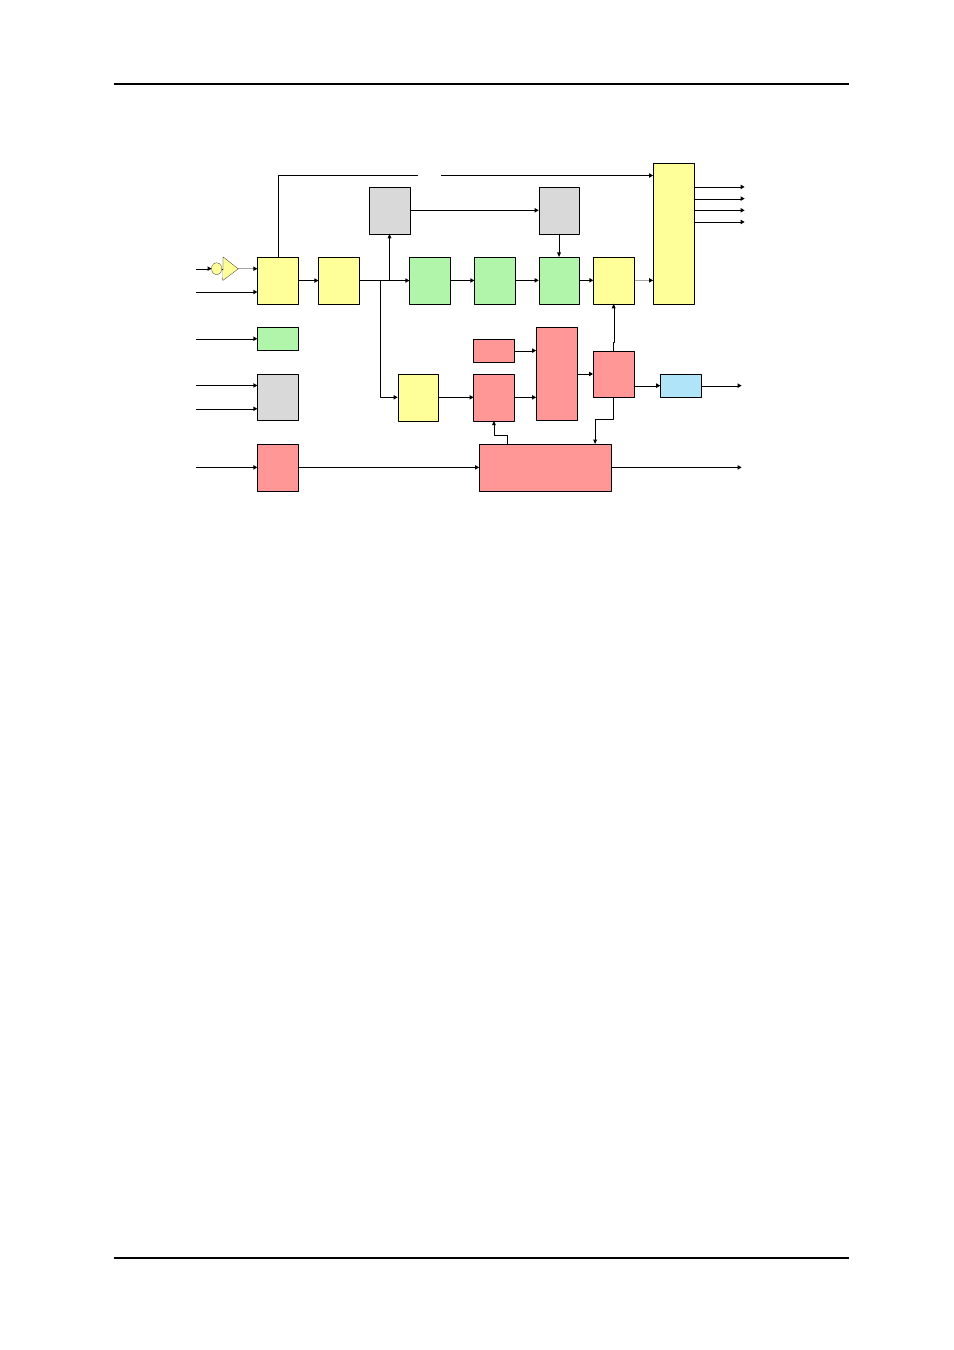 medium resolution of rockchip rk3066 table reference design block diagram 1 20block diagram 3g 20